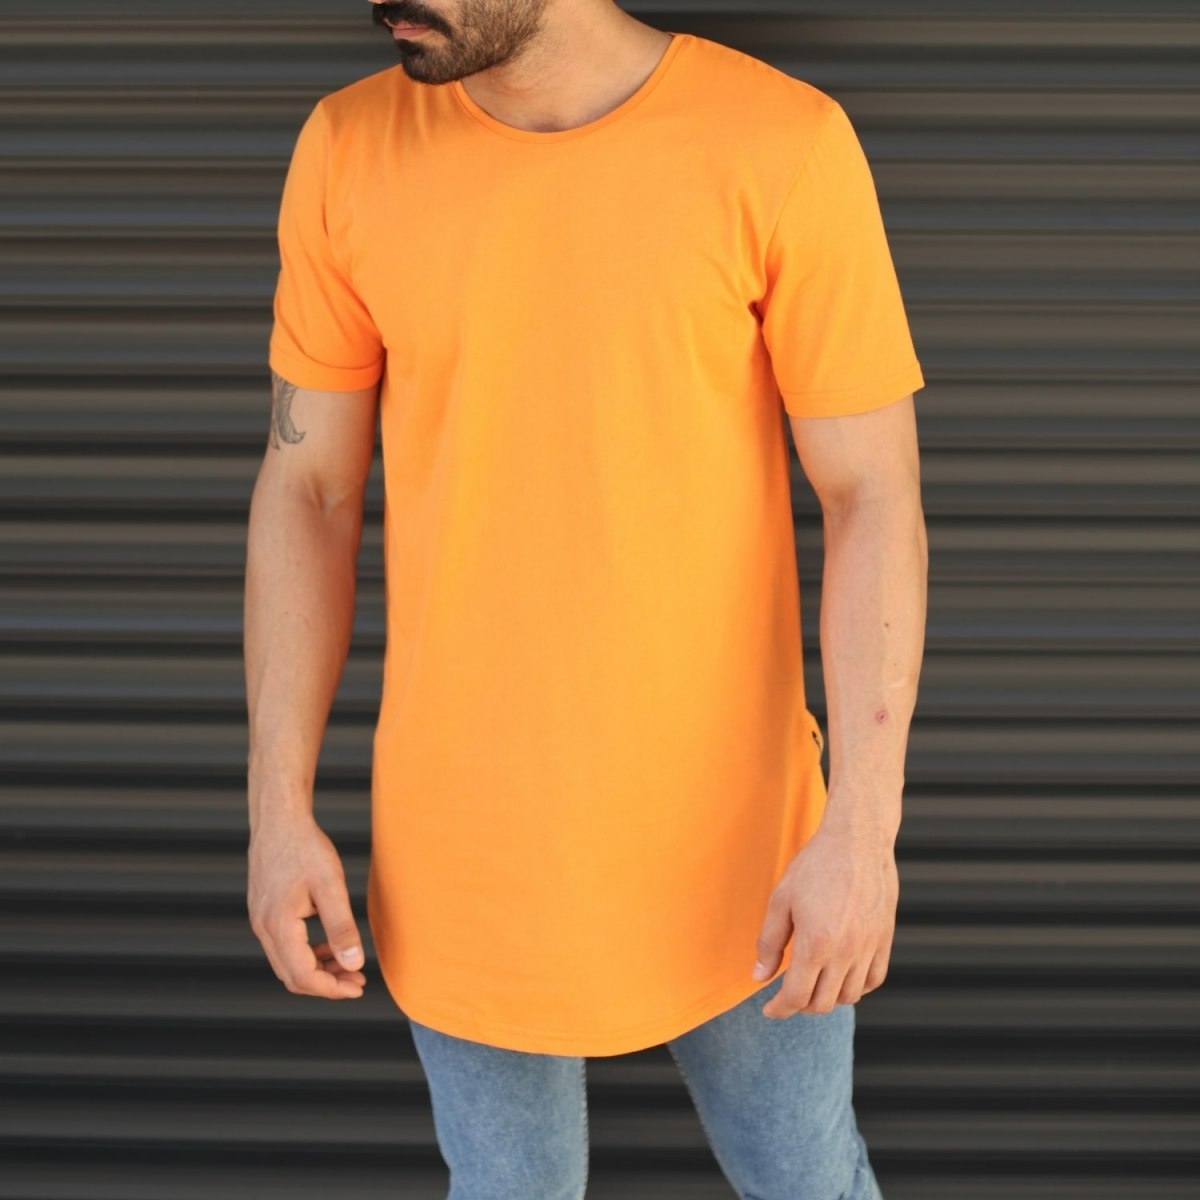 Men's Longline Round Neck T-Shirt In Orange Mv Premium Brand - 1